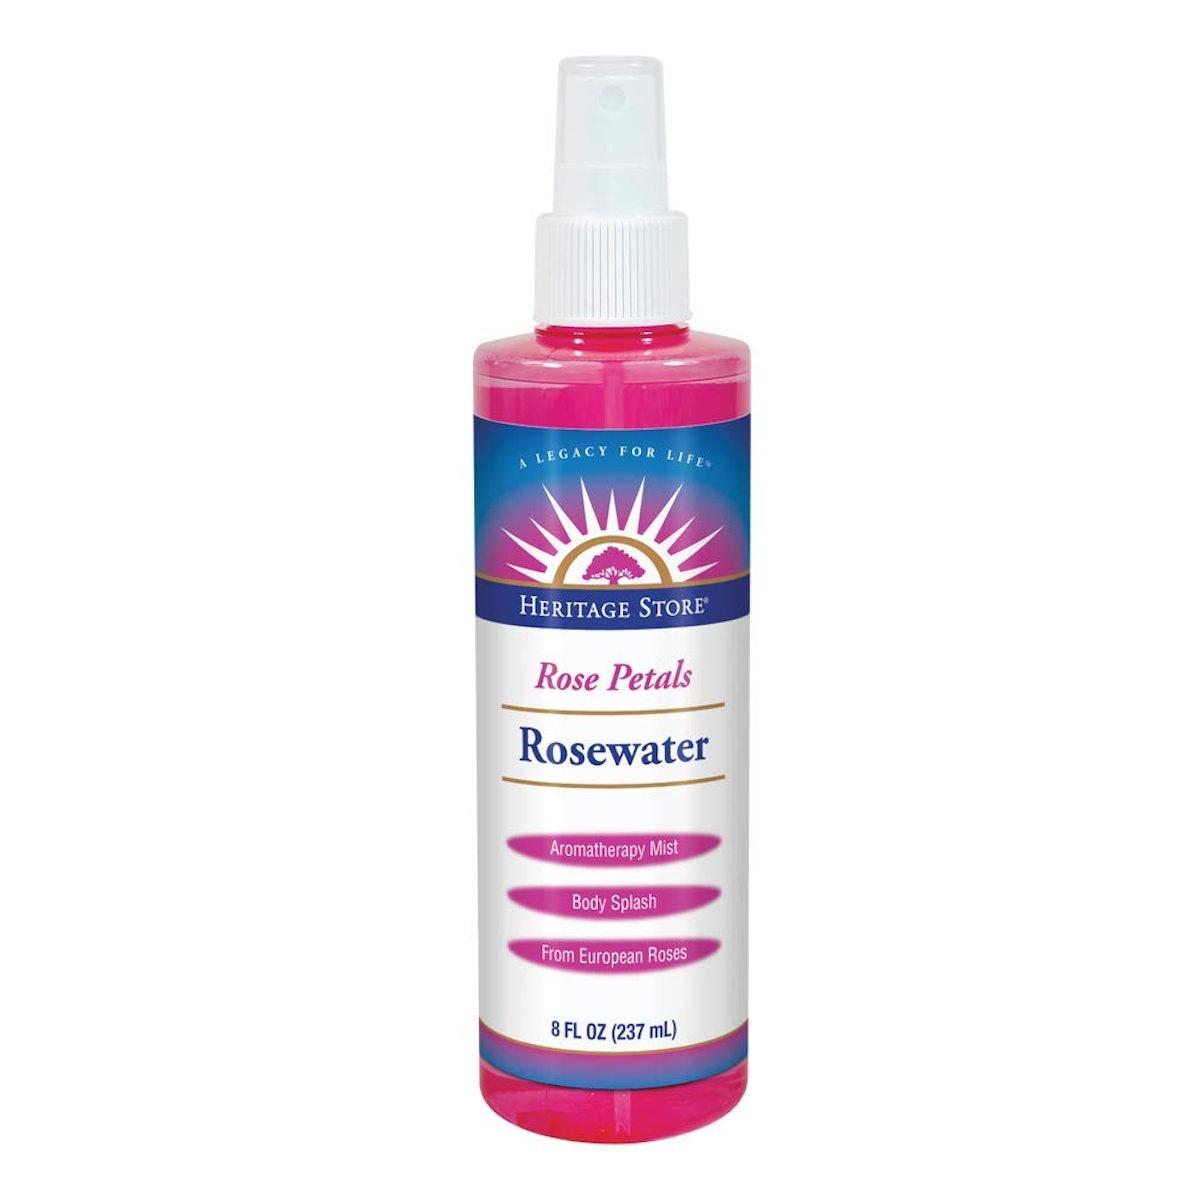 Heritage Store Rosewater Spray